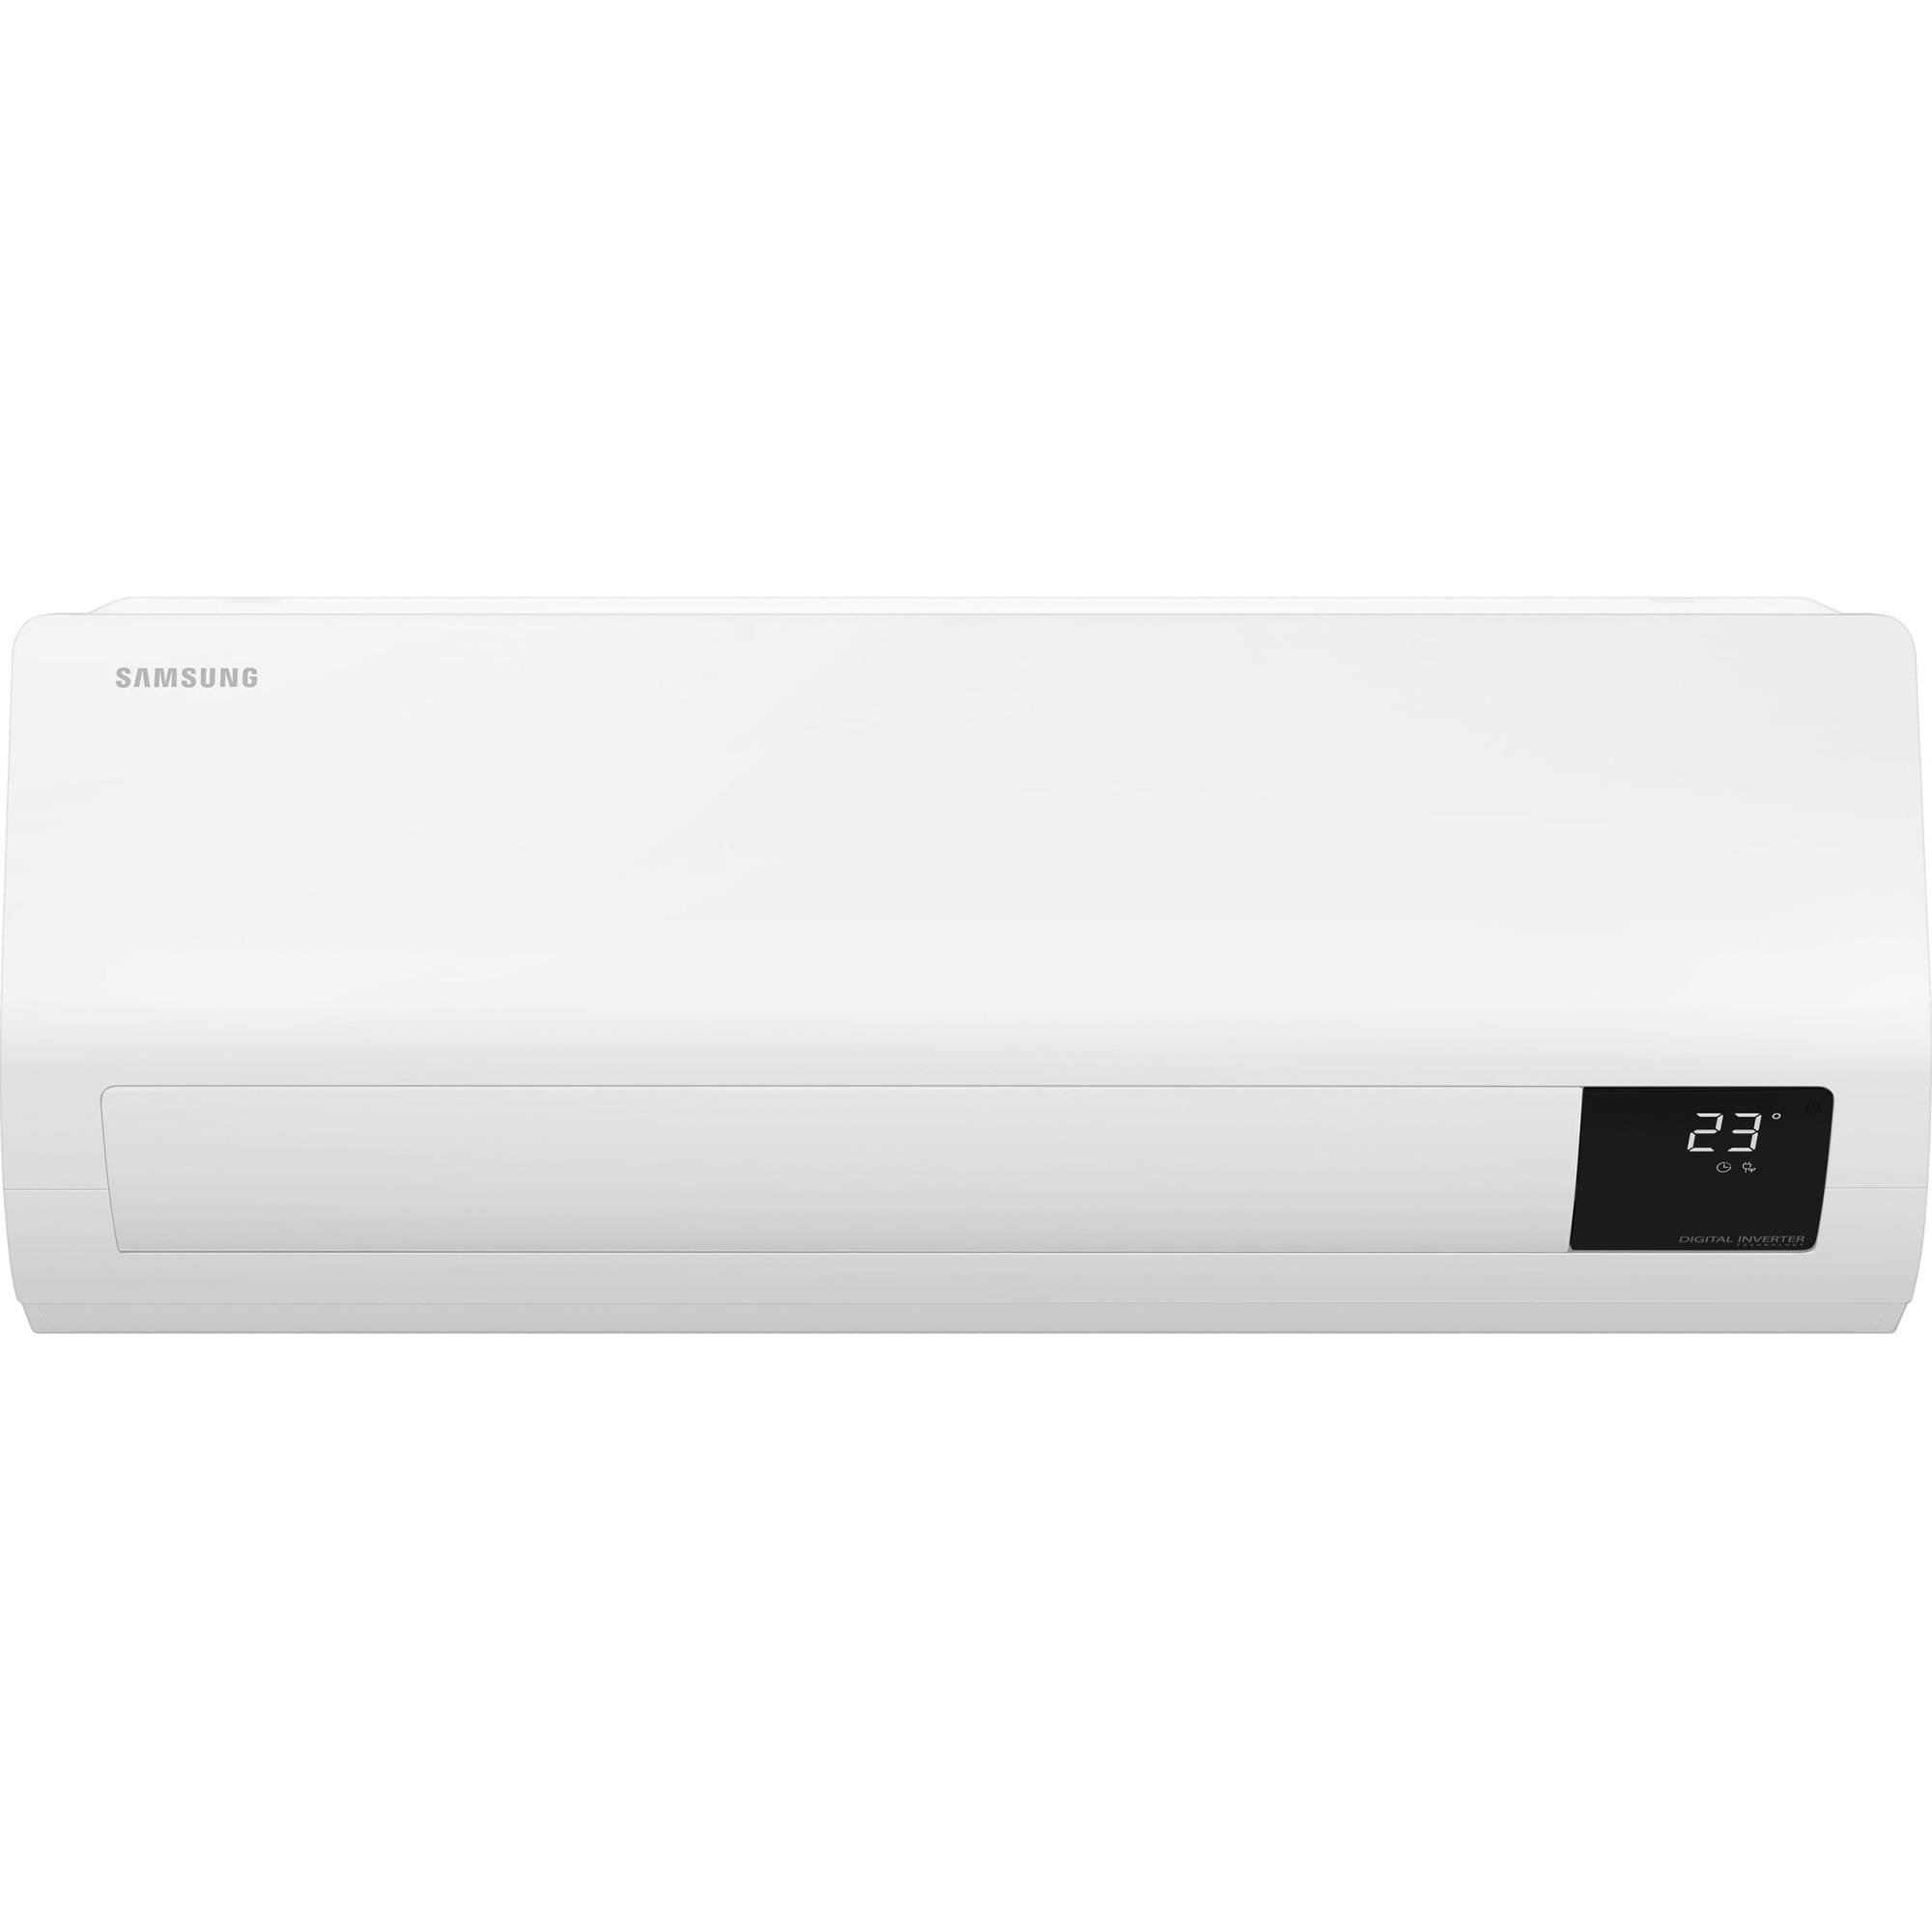 Fotografie Aparat de aer conditionat Samsung Luzon 12000 BTU, Clasa A++/A+, Fast cooling, Mod Eco, AR12TXHZAWKNEU/AR12TXHZAWKXEU, Alb